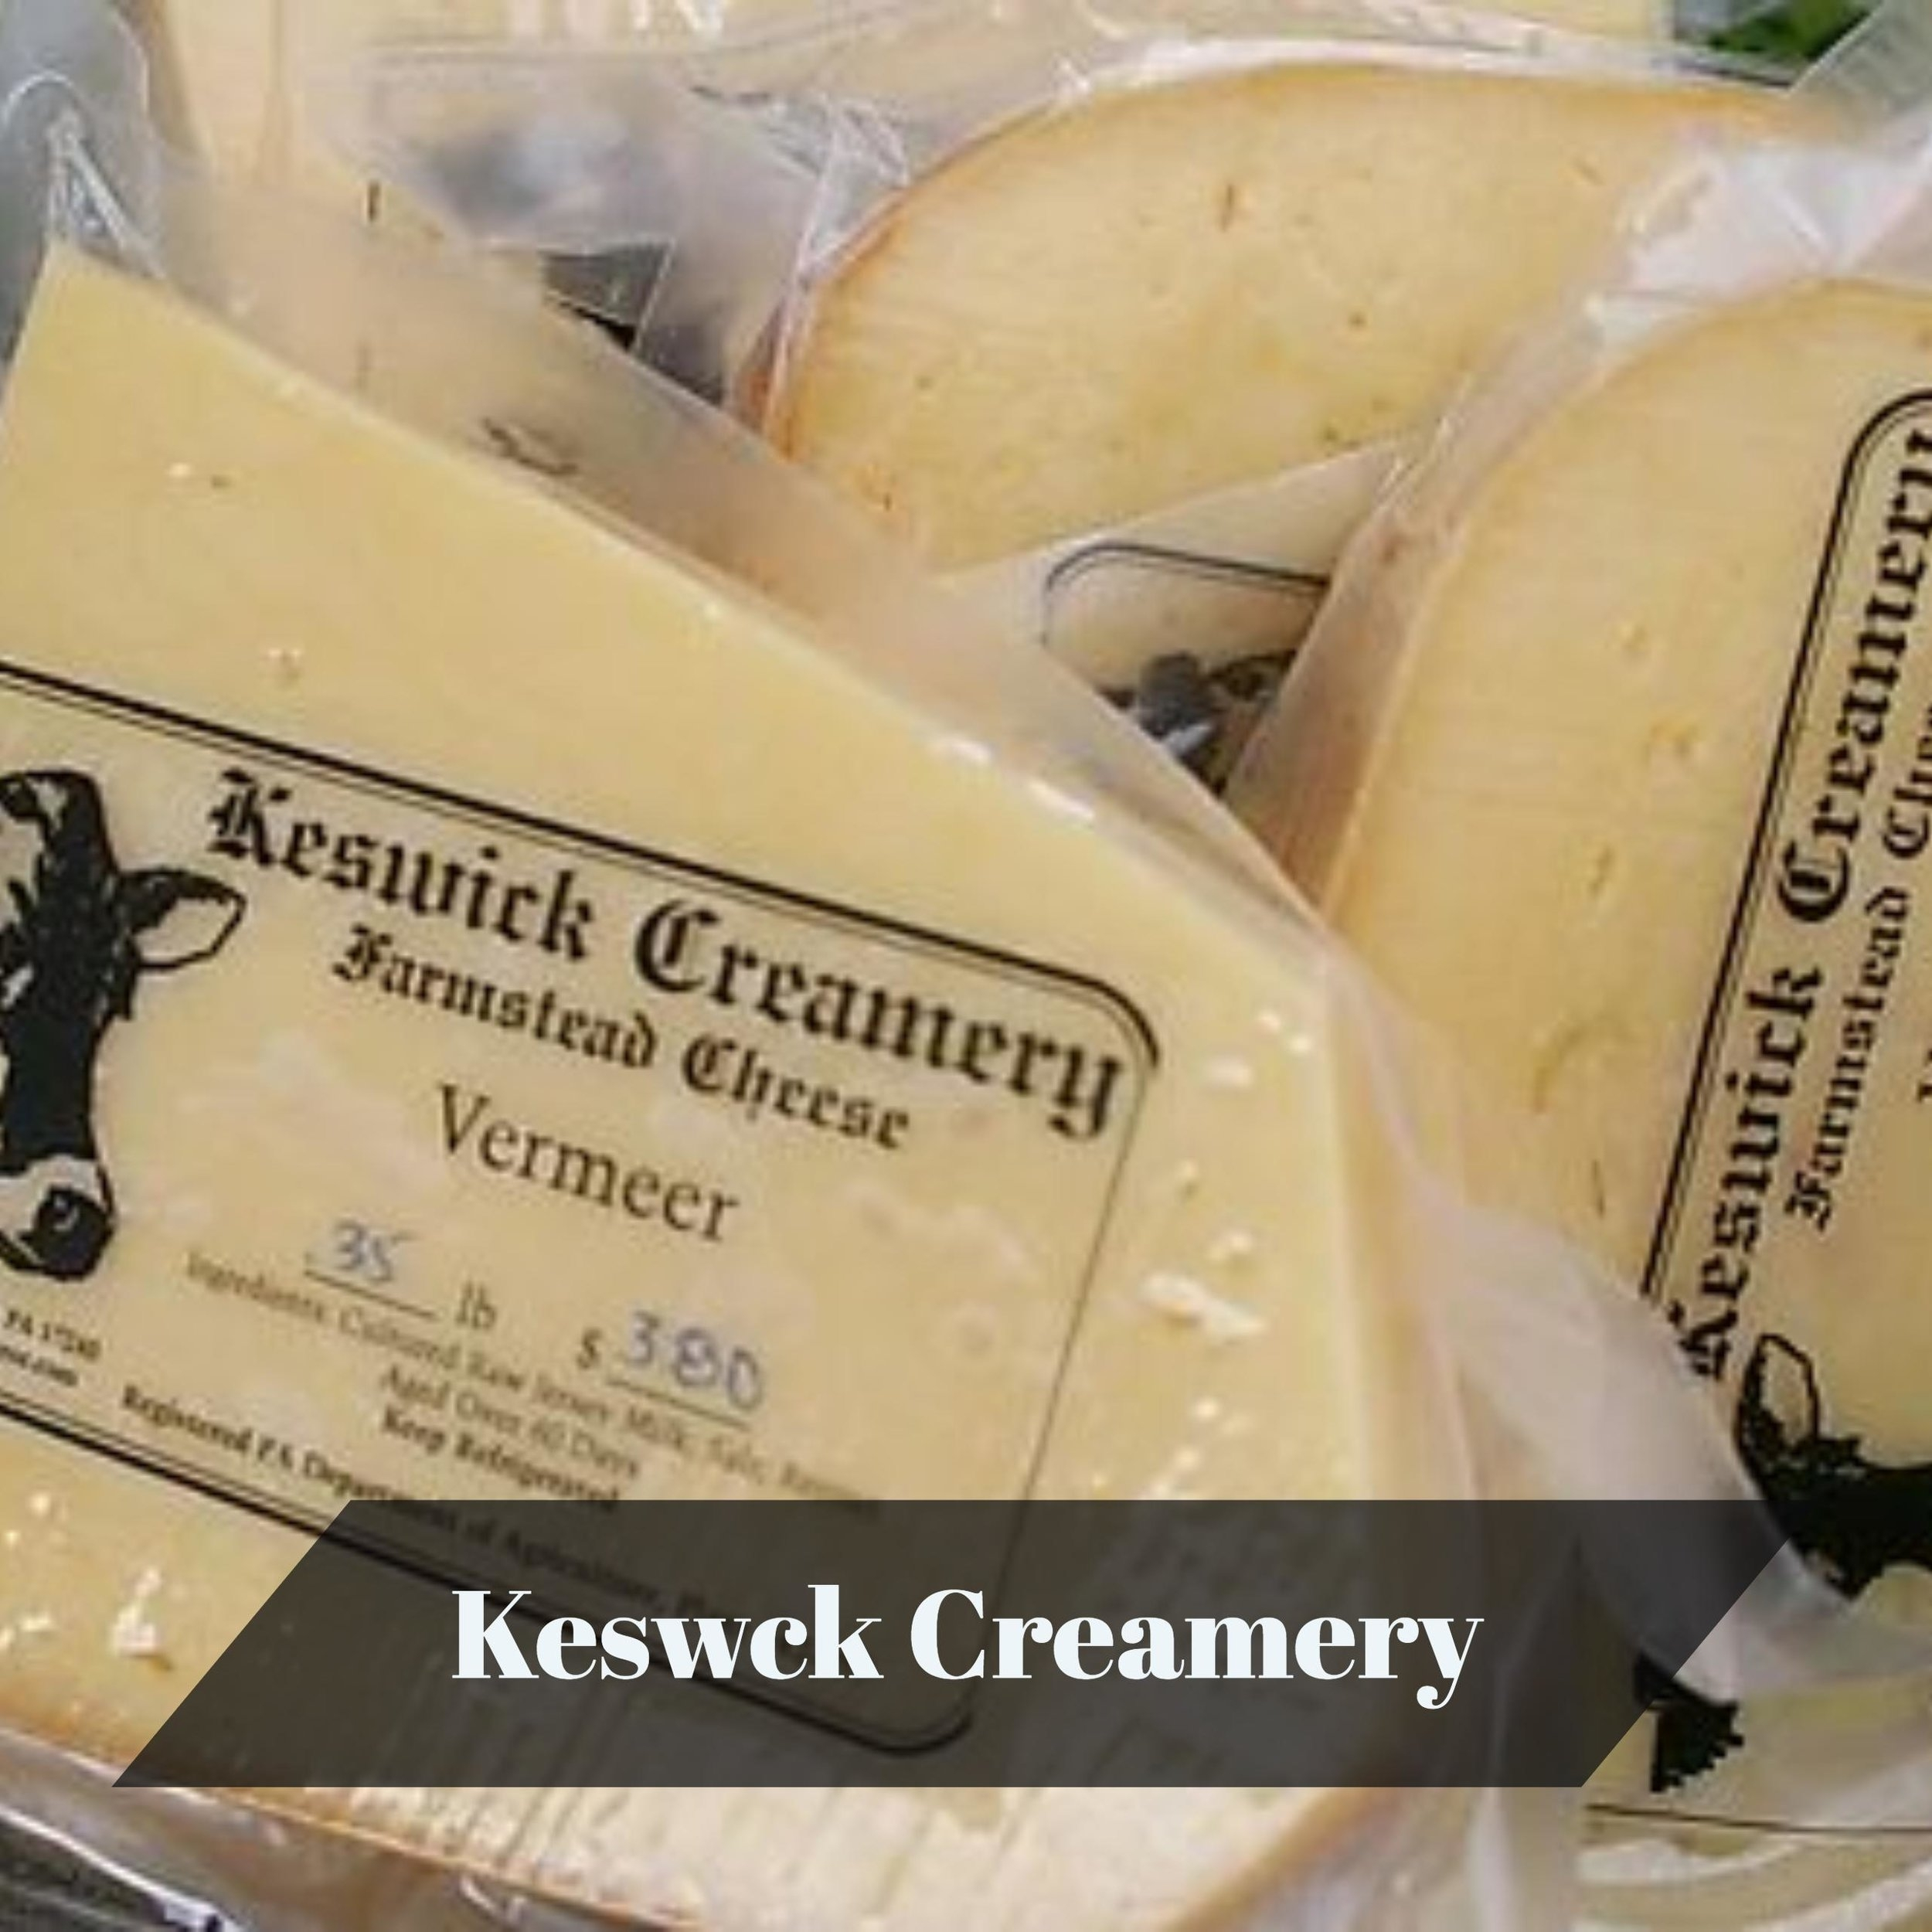 Keswick Creamery